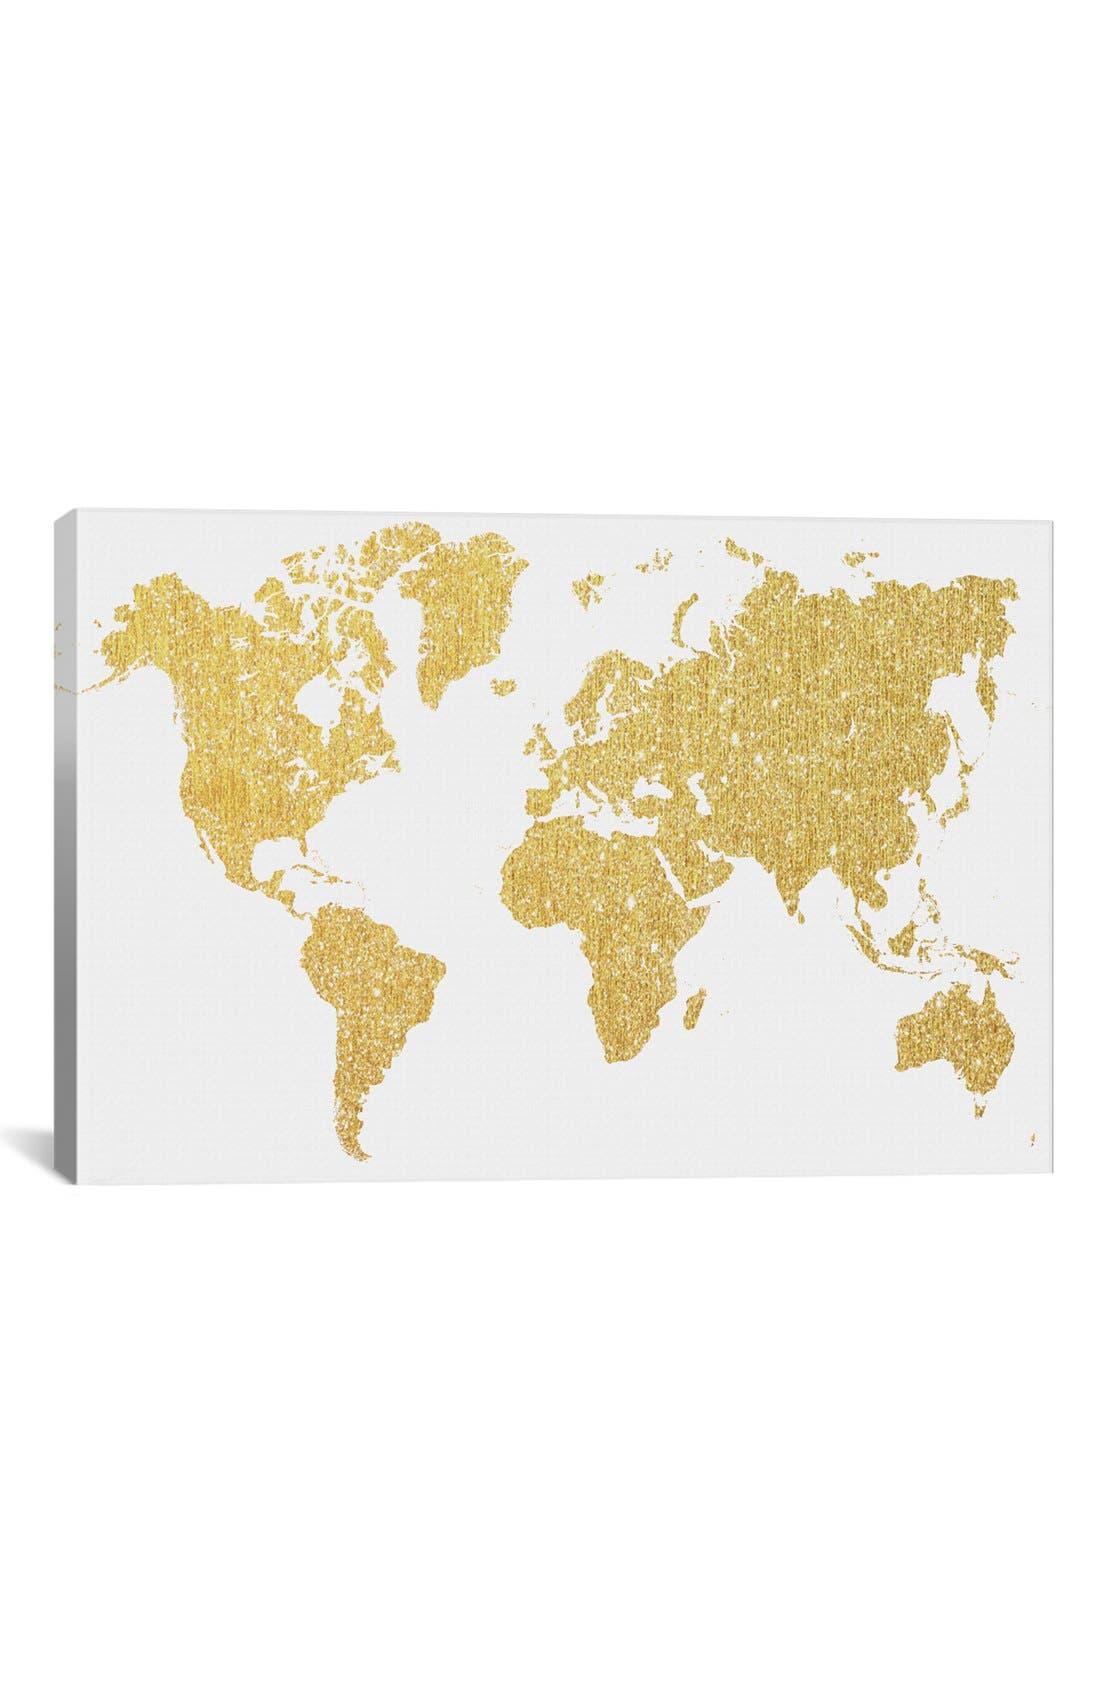 iCanvas 'Gold Map' Giclée Print Canvas Art